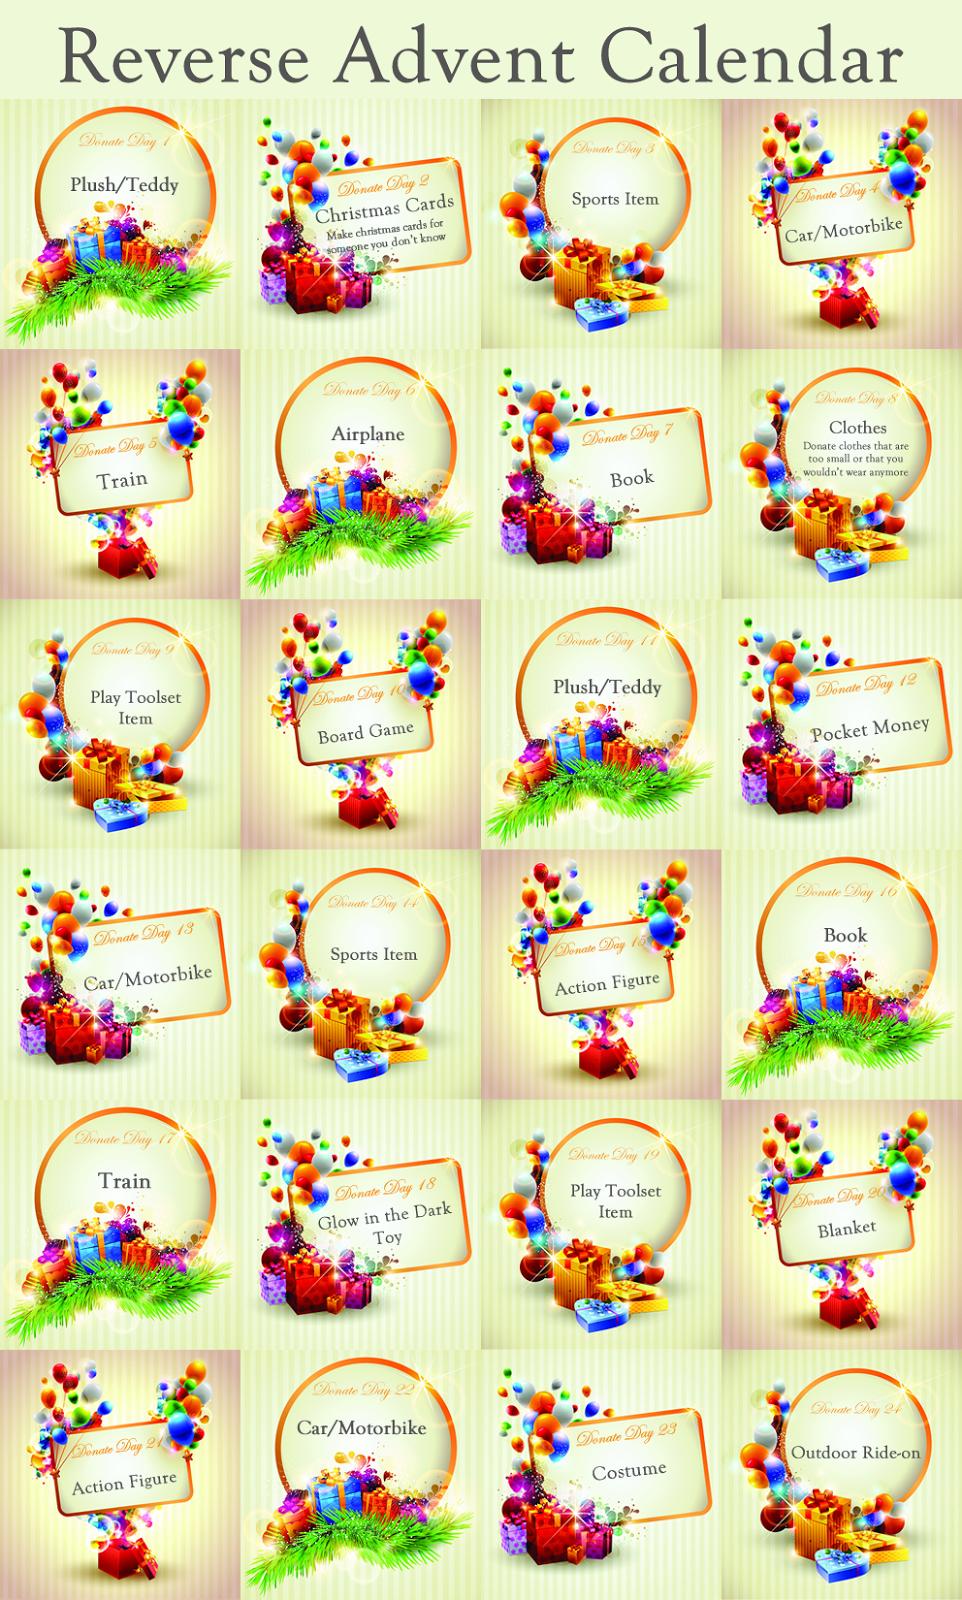 Reverse Advent Calendar Ideas : Reverse advent calendar instead of giving kids small